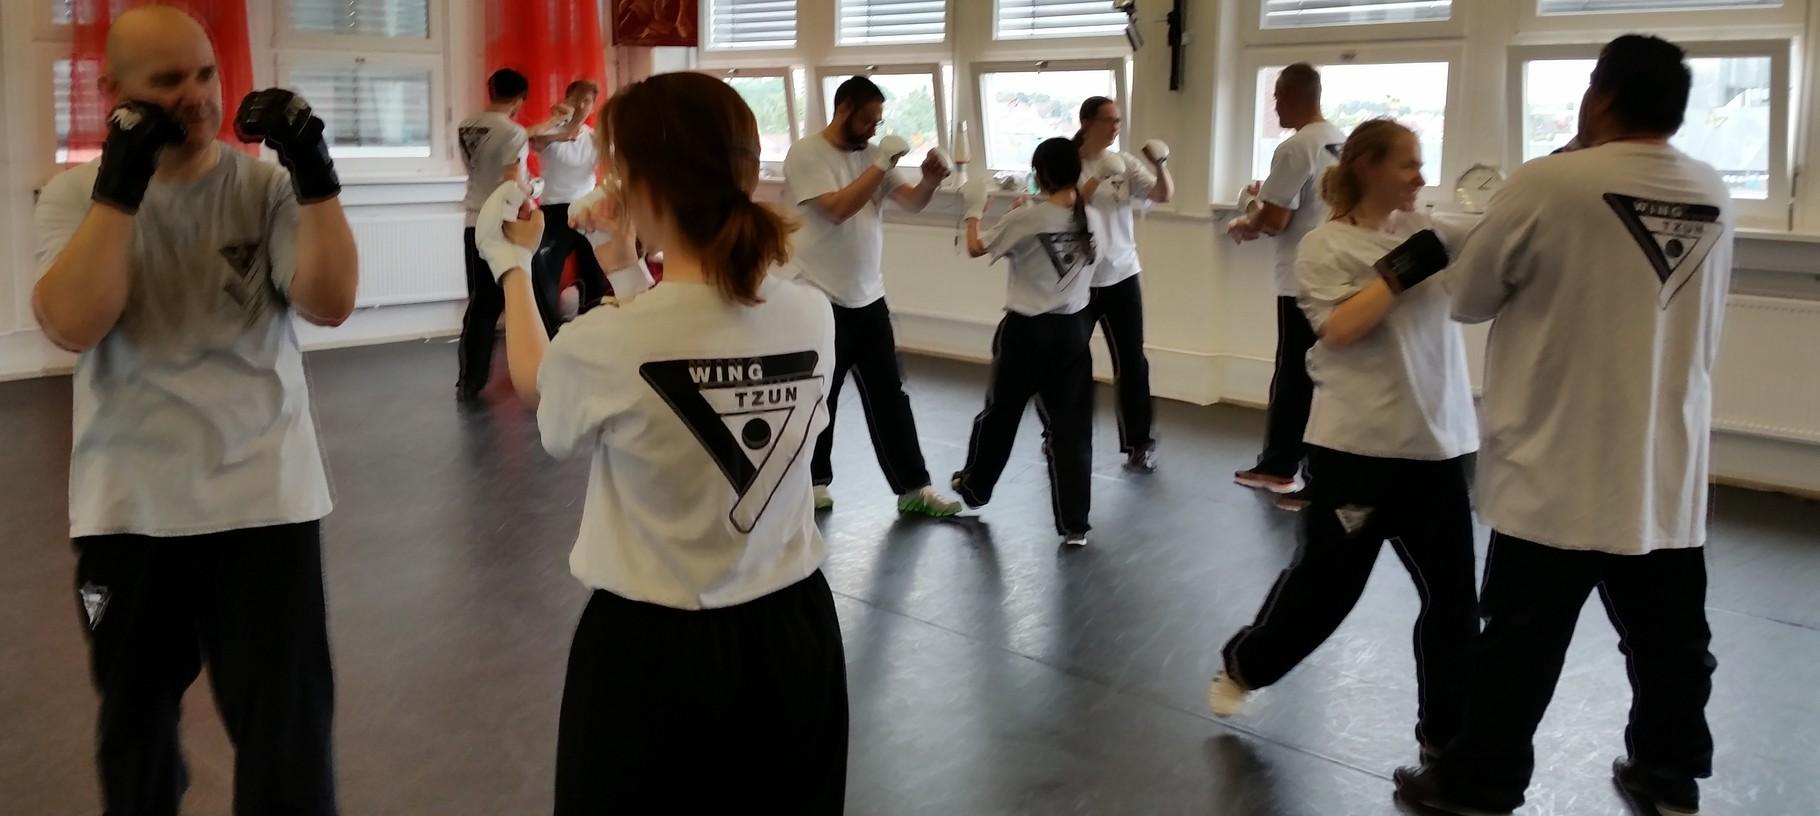 Wing Tsun Selbstverteidigung Ludwigsburg - Seminar 20. Juni 2015_5